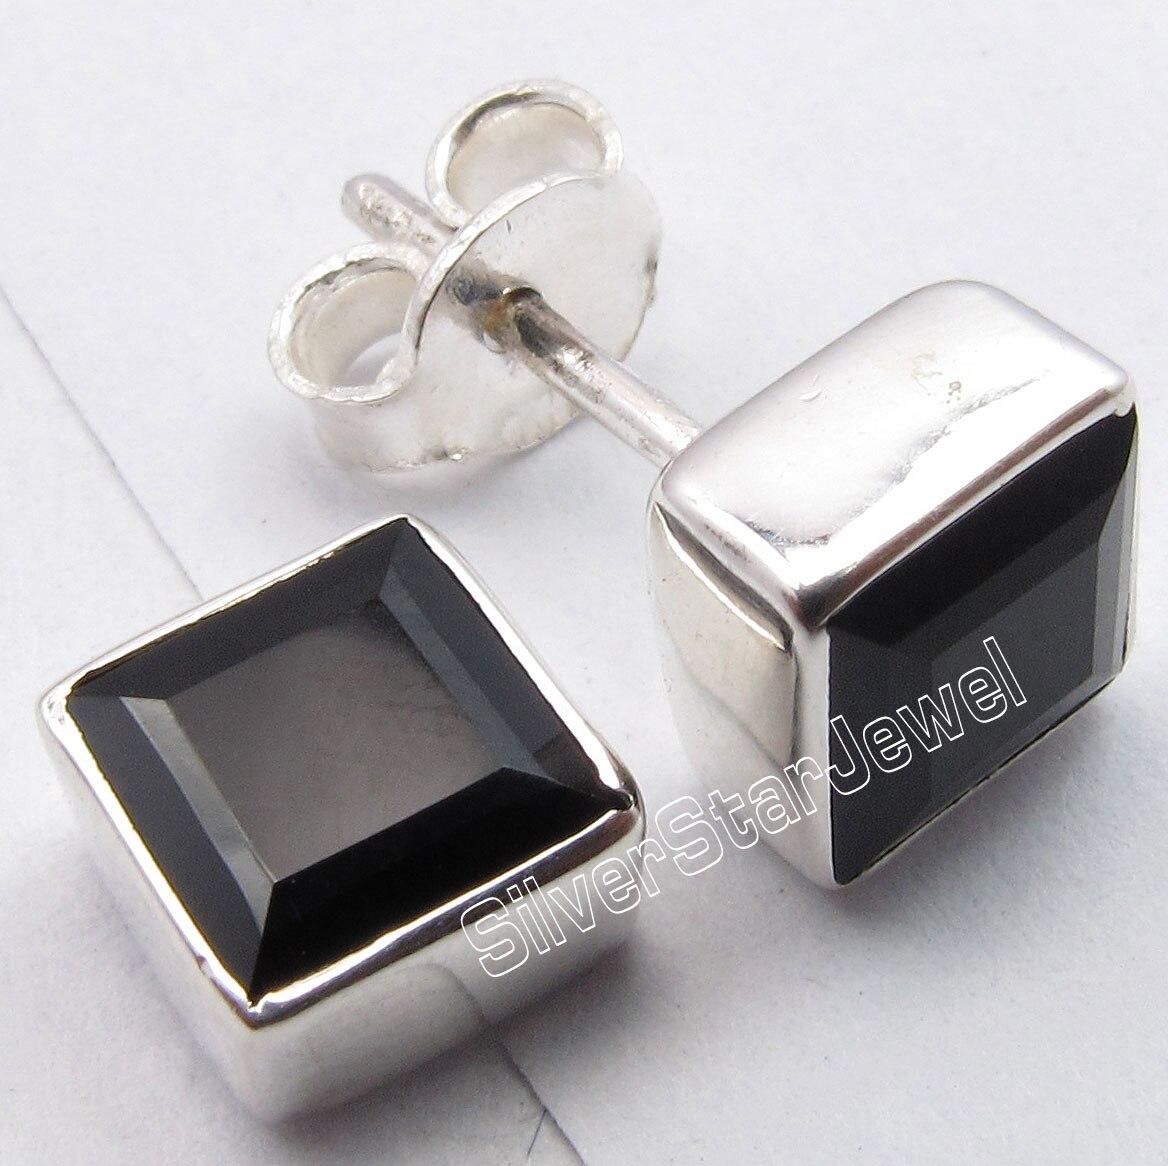 7dbf2ce1b41c Chanti plata internacional genuino negro Onyx Square gemset agradable  espárragos Pendientes 0.7 cm